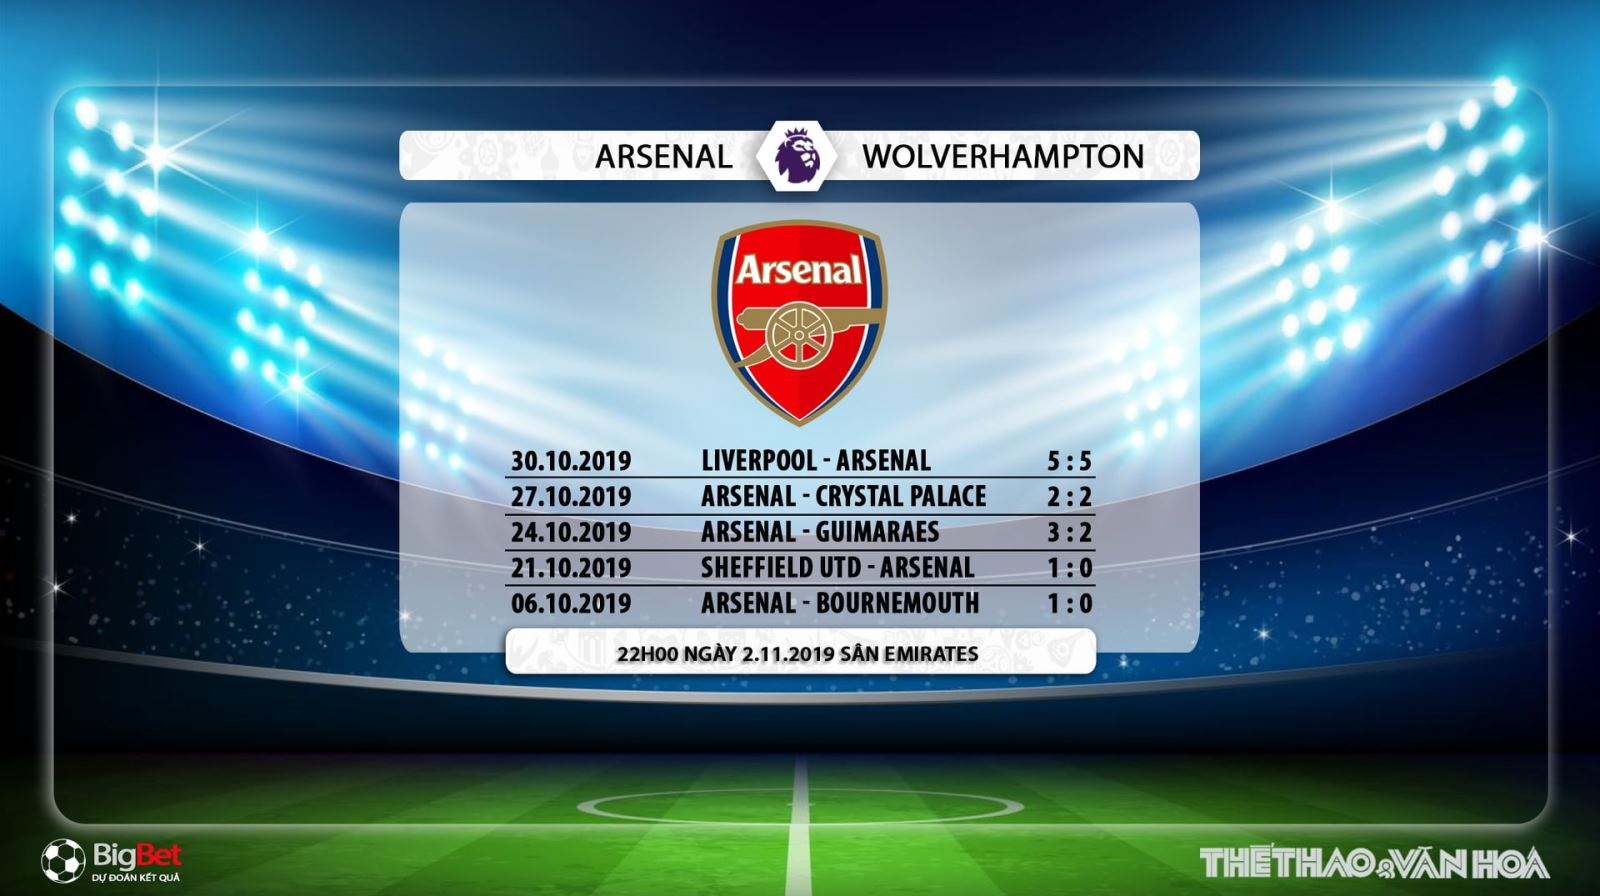 Arsenal vs Wolves, trực tiếp bóng đá Arsenal vs Wolves, arsenal, wolves, lịch thi đấu bóng đá, nhận định Arsenal vs Wolves, soi kèo Arsenal vs Wolves